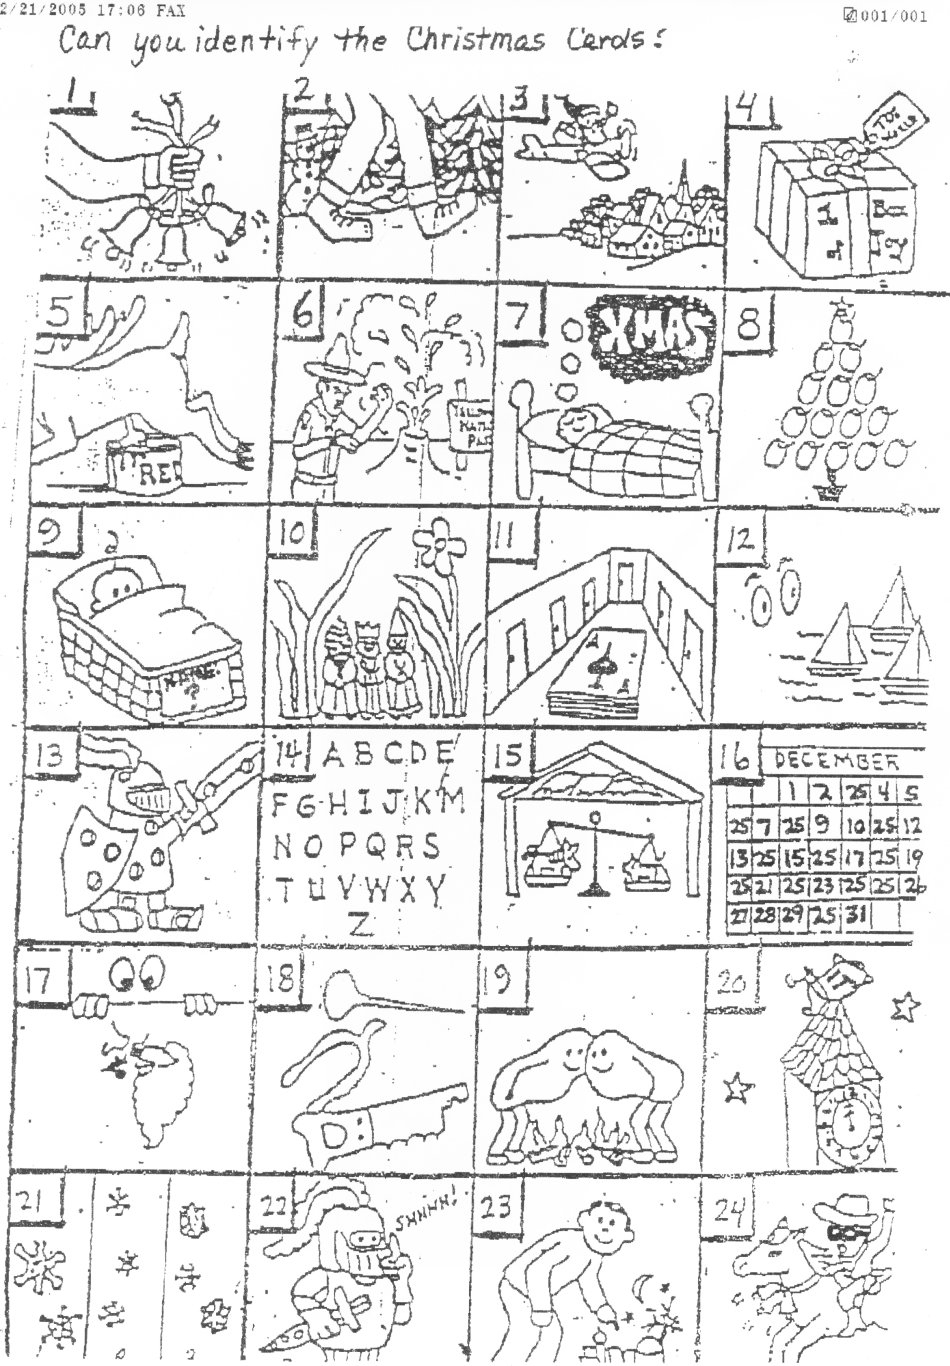 The Original Puzzle - Printable Christmas Rebus Puzzles